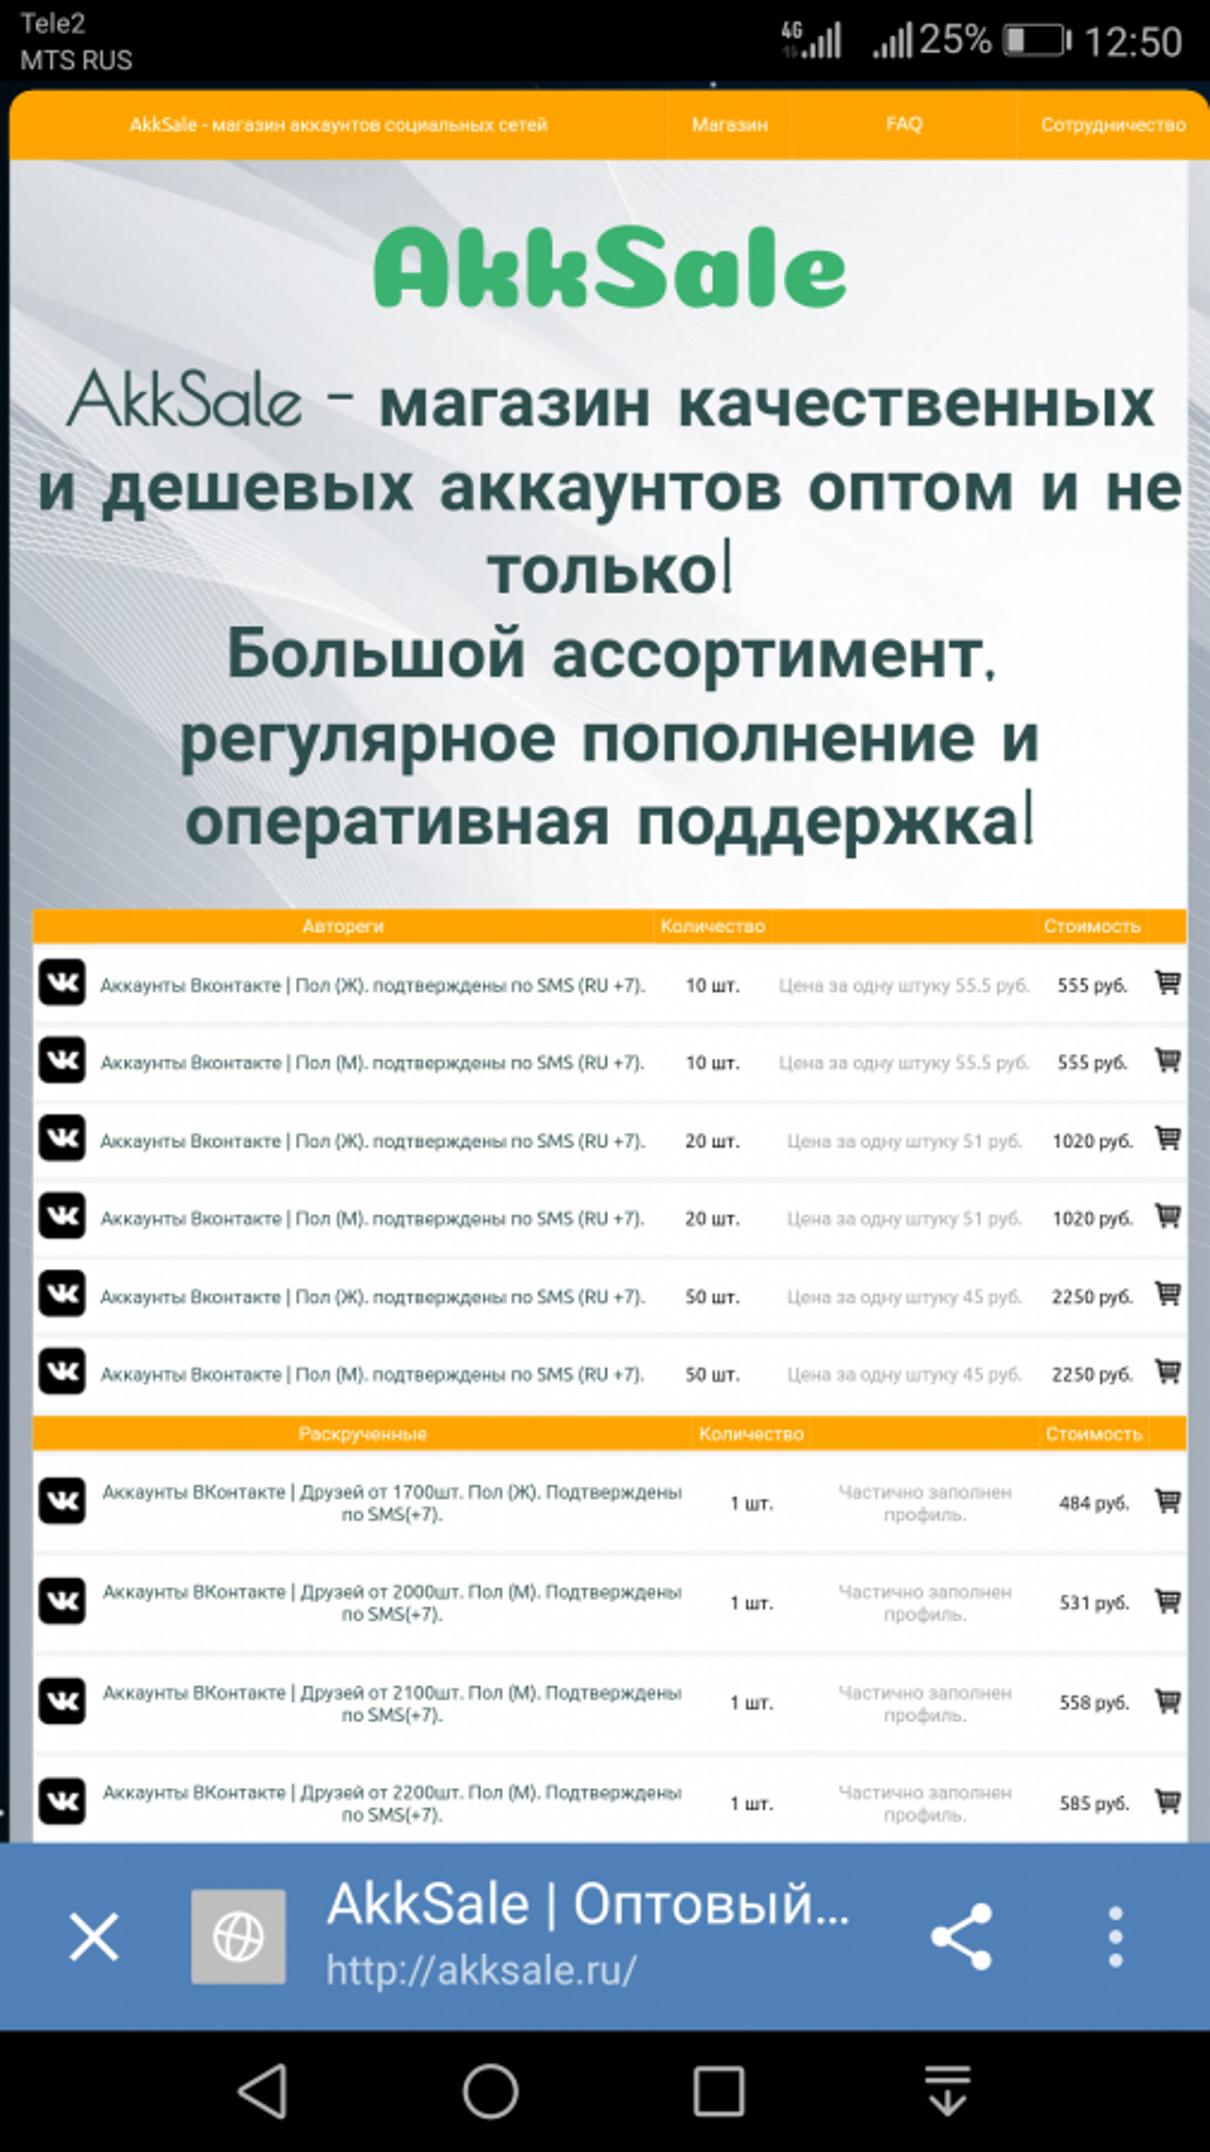 Жалоба-отзыв: Сайт akksale.ru - Развод на деньги